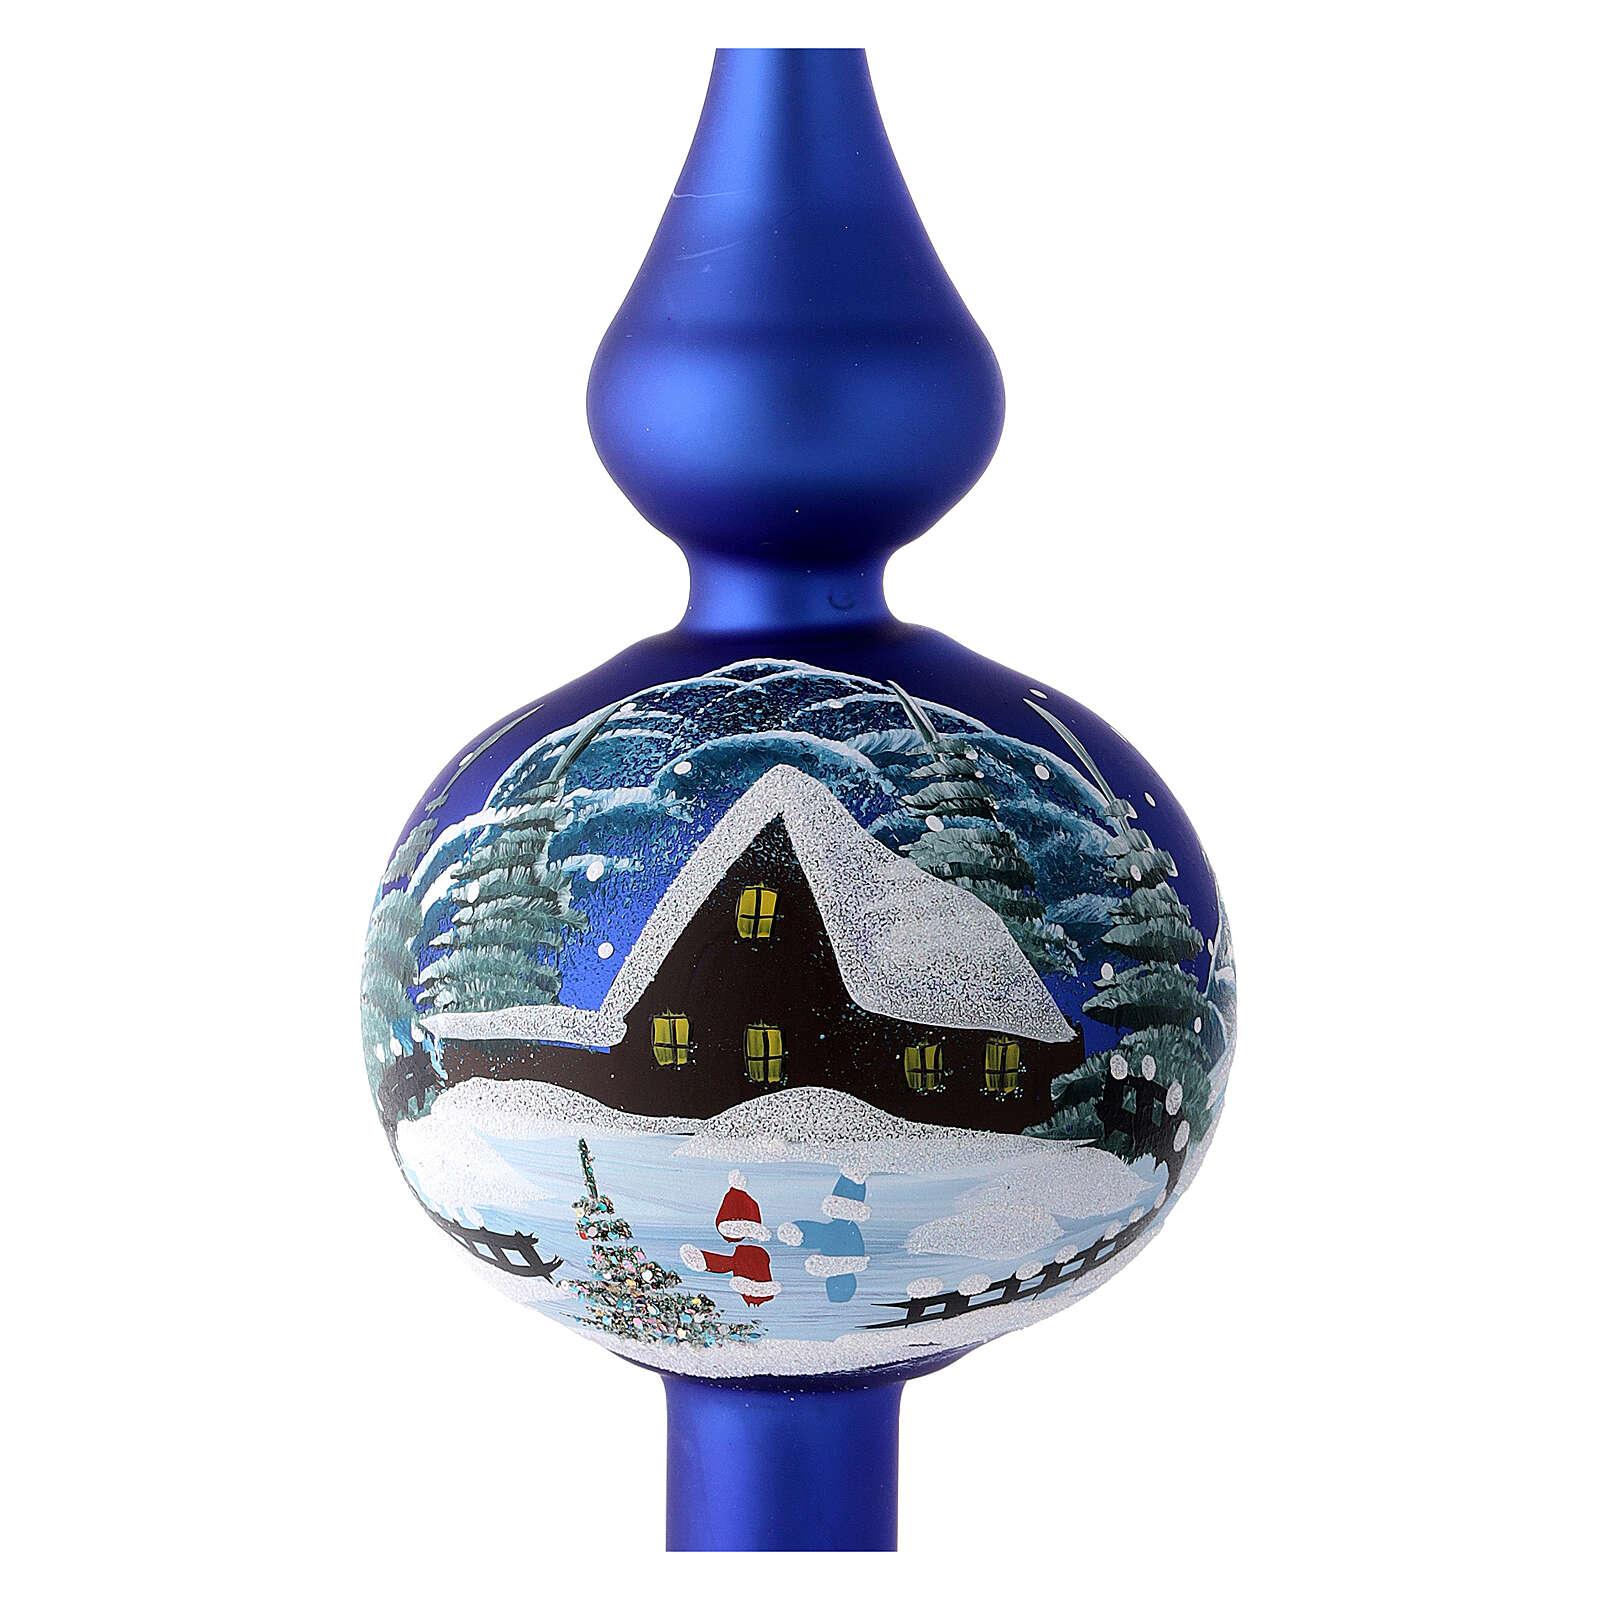 Punta navideño azul casas nevadas vidrio soplado 35 cm 4